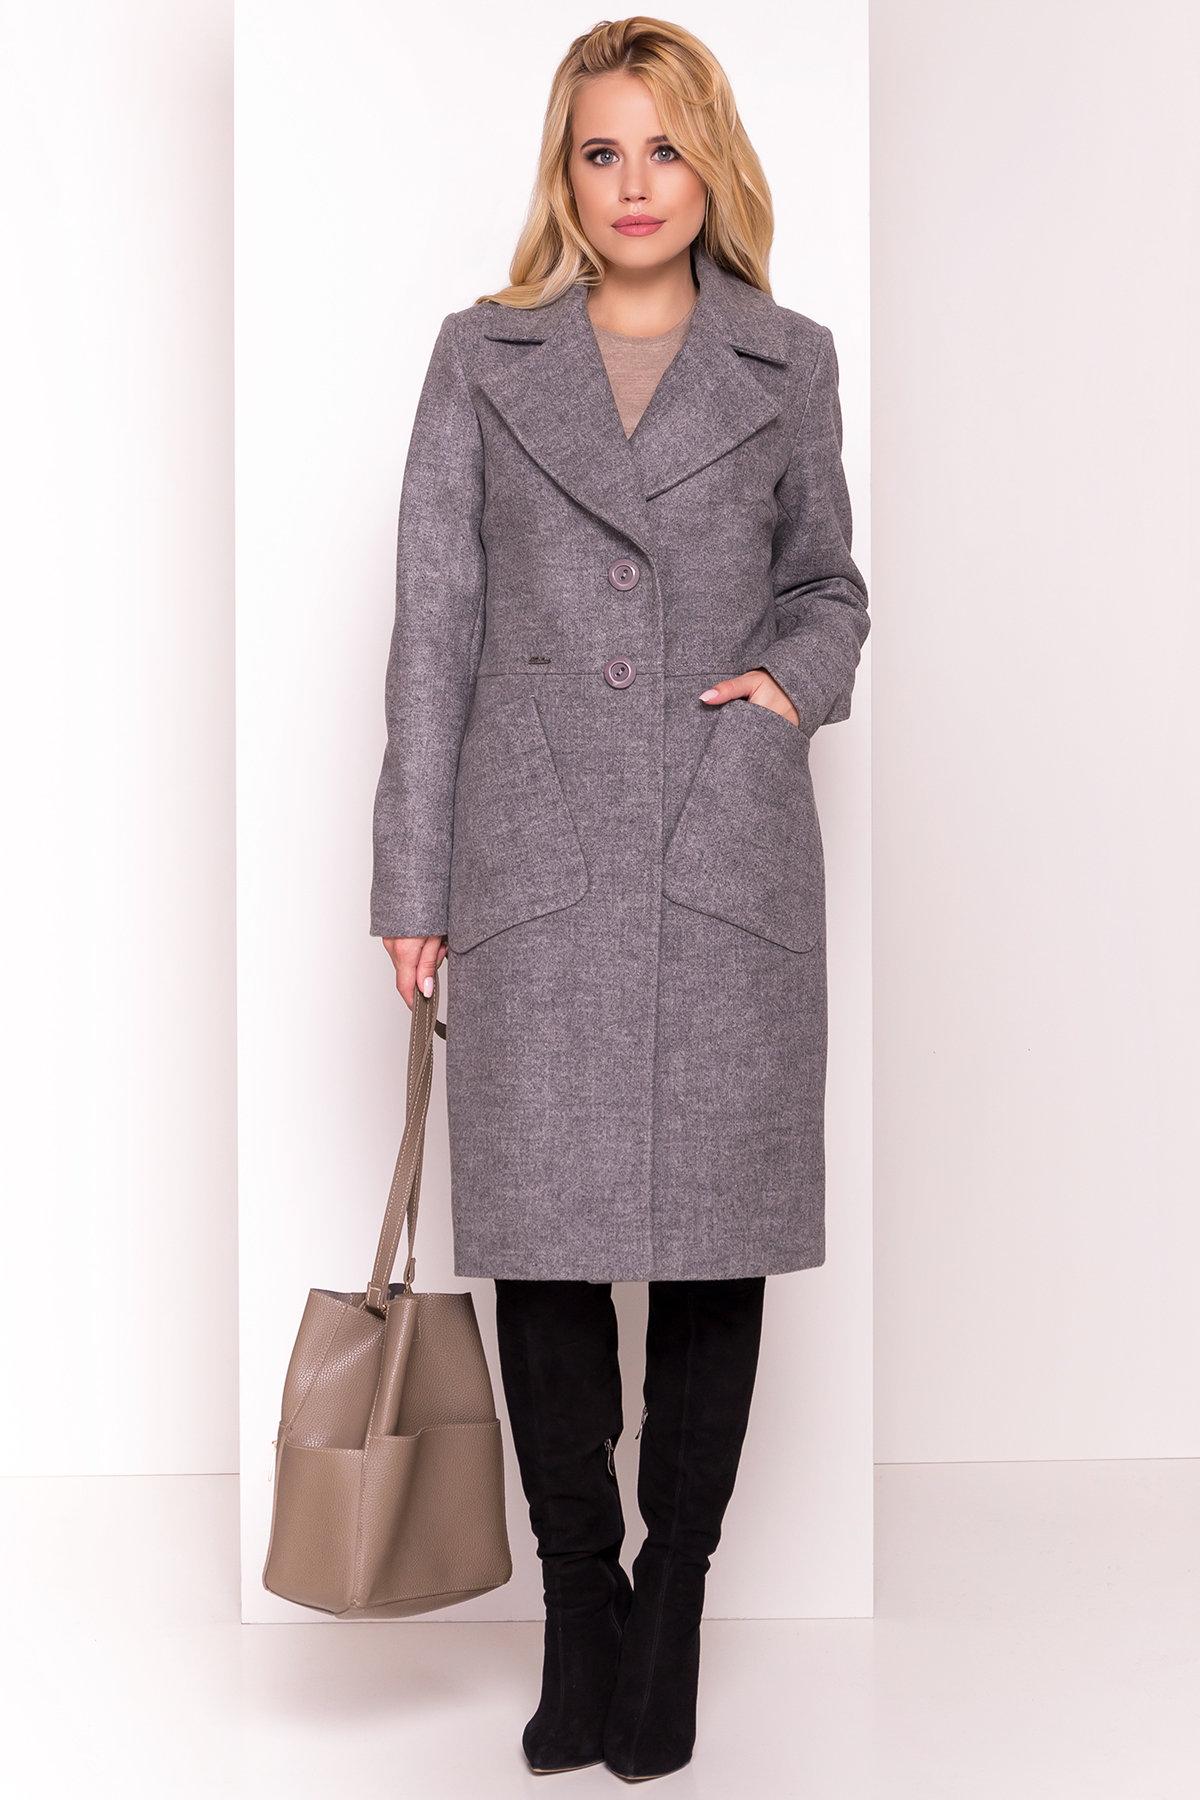 Пальто Габриэлла 4459 АРТ. 21654 Цвет: Серый 18 - фото 2, интернет магазин tm-modus.ru